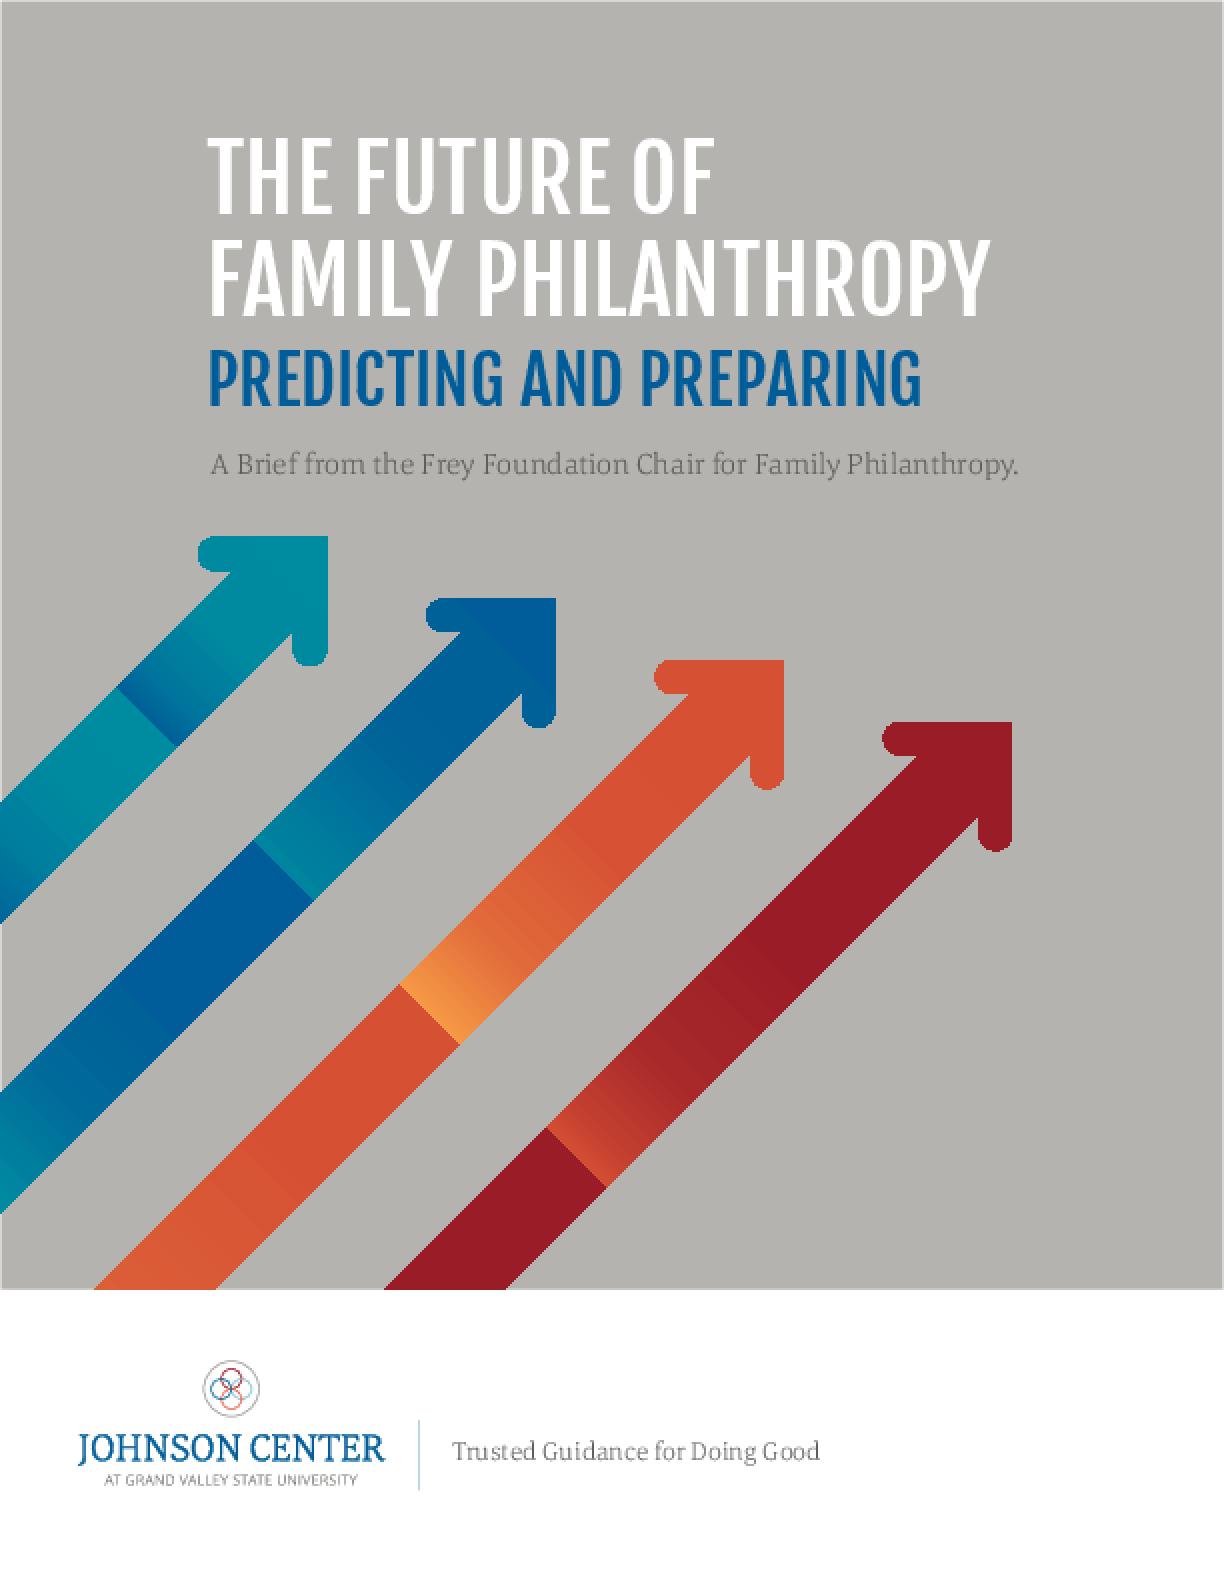 The Future of Family Philanthropy: Predicting and Preparing